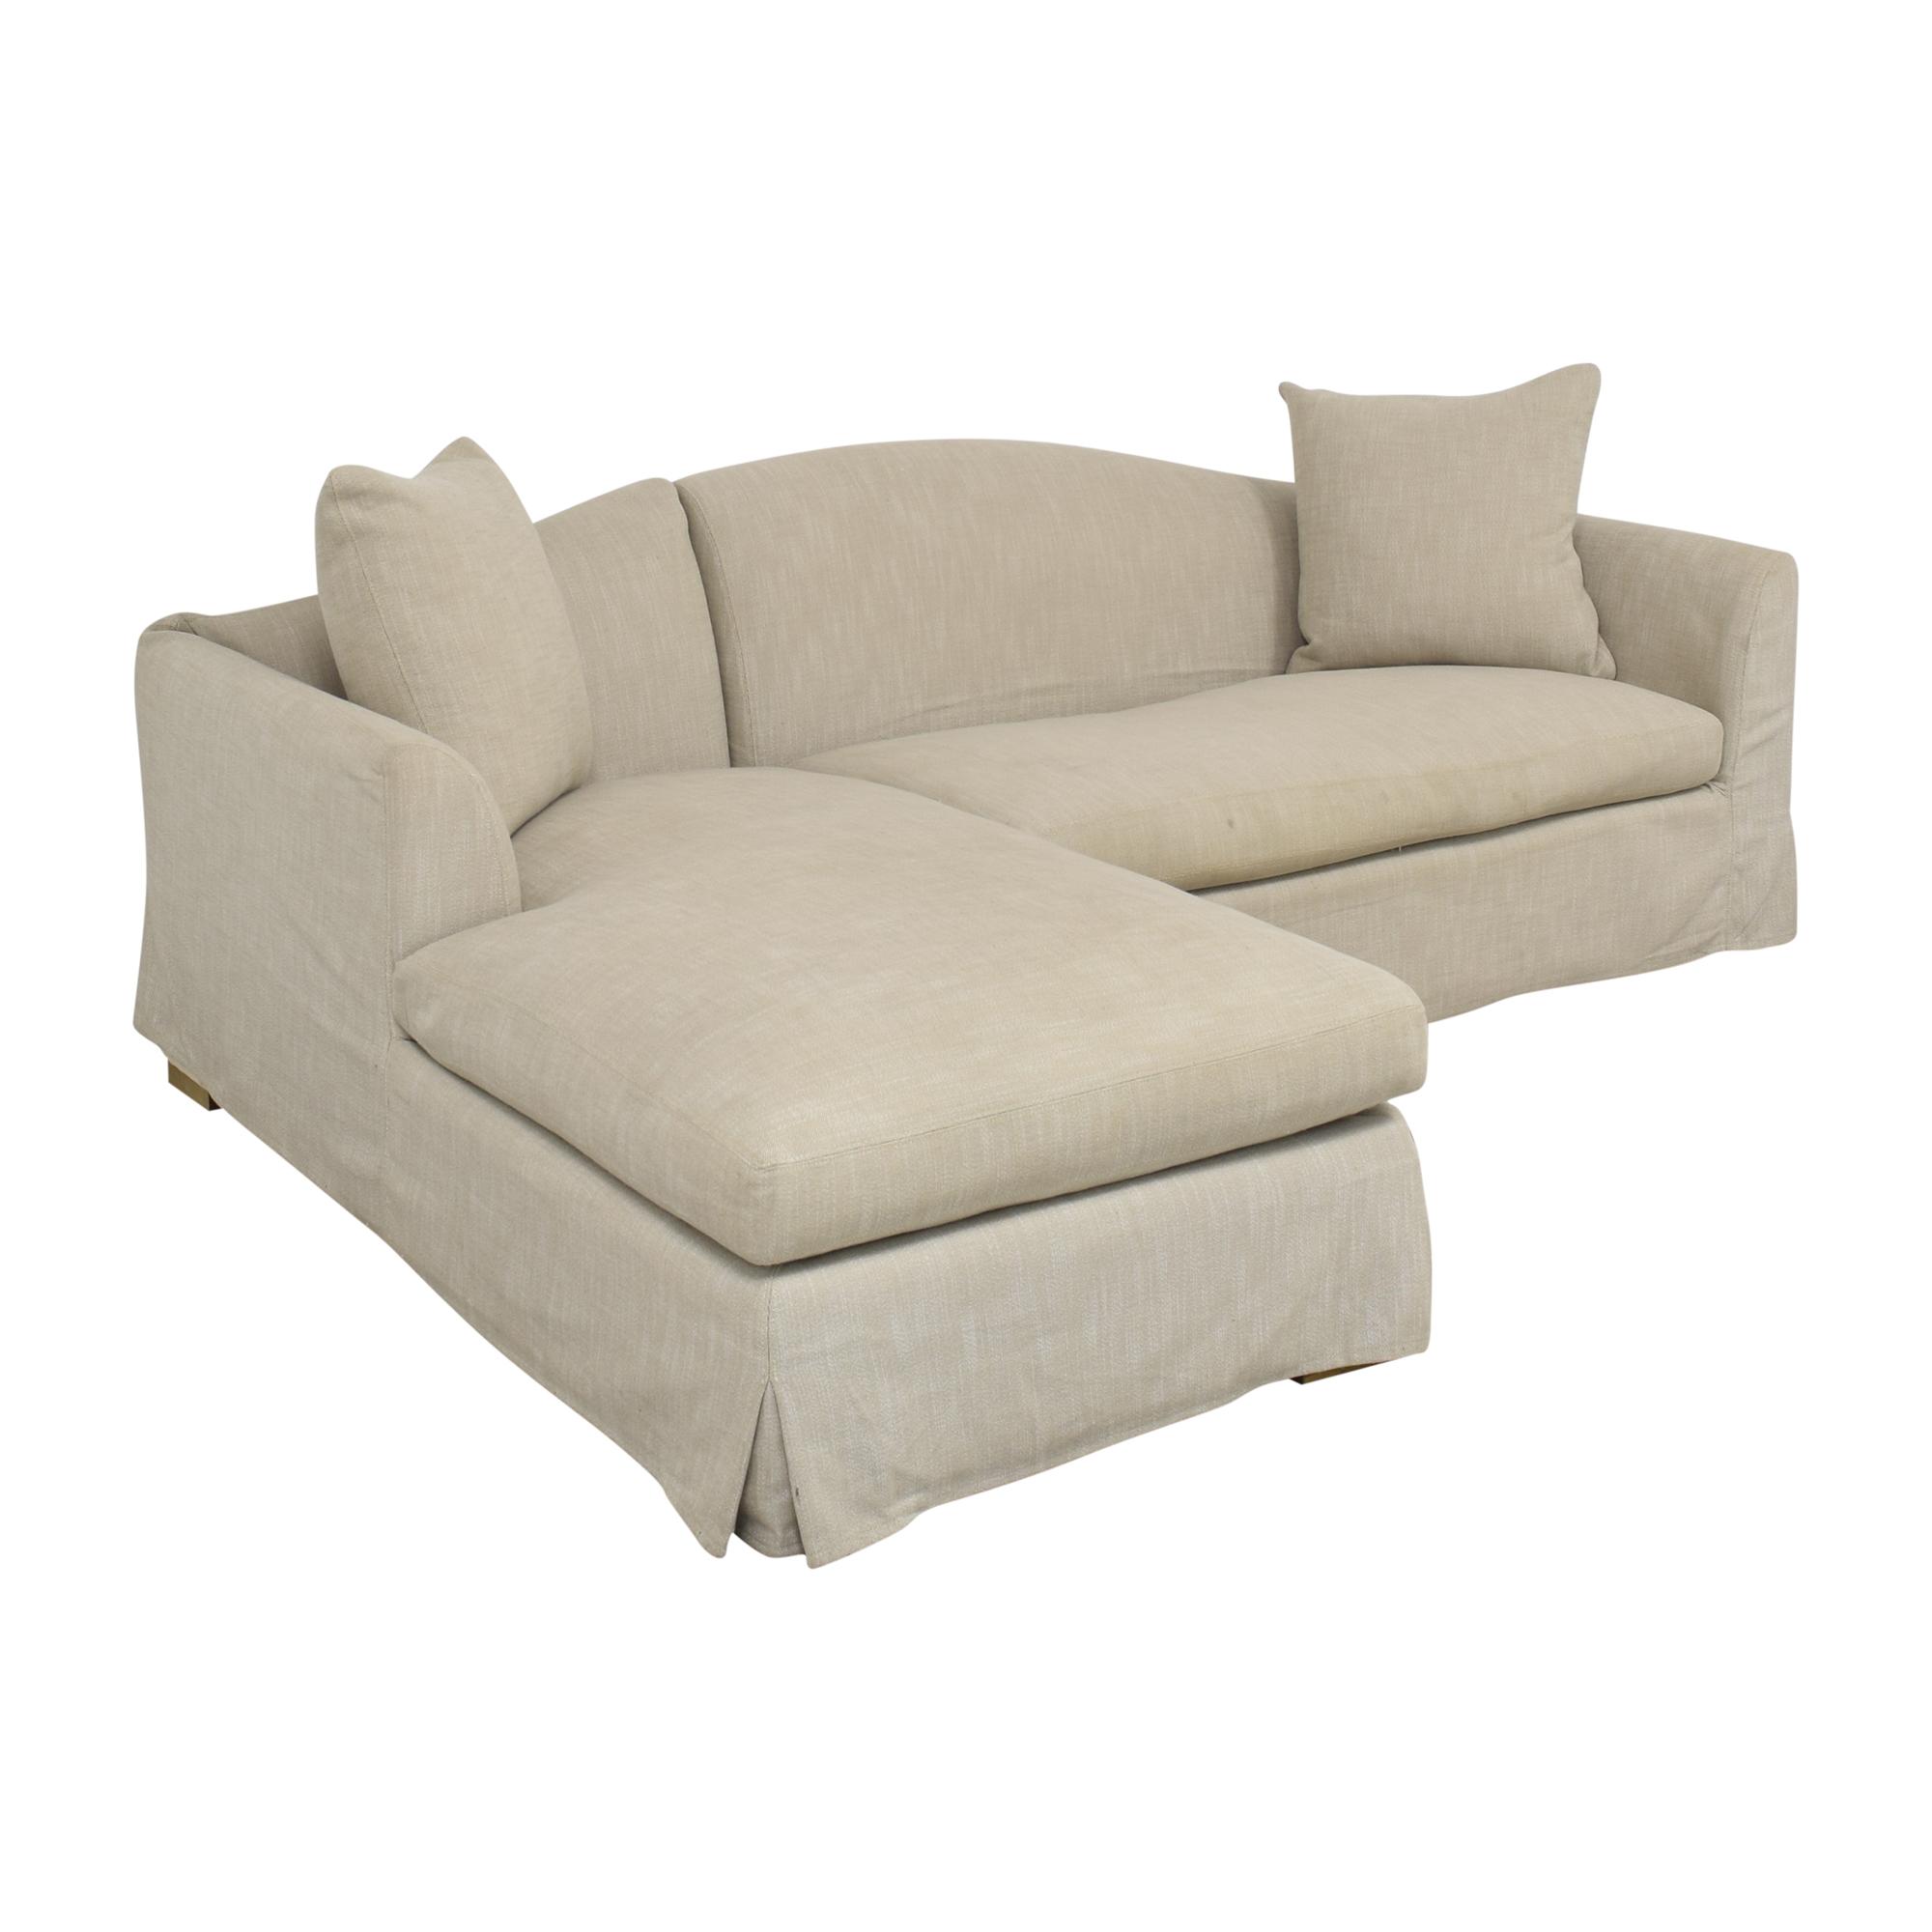 buy Restoration Hardware Belgian Camelback Slipcovered Sectional Sofa with Chaise Restoration Hardware